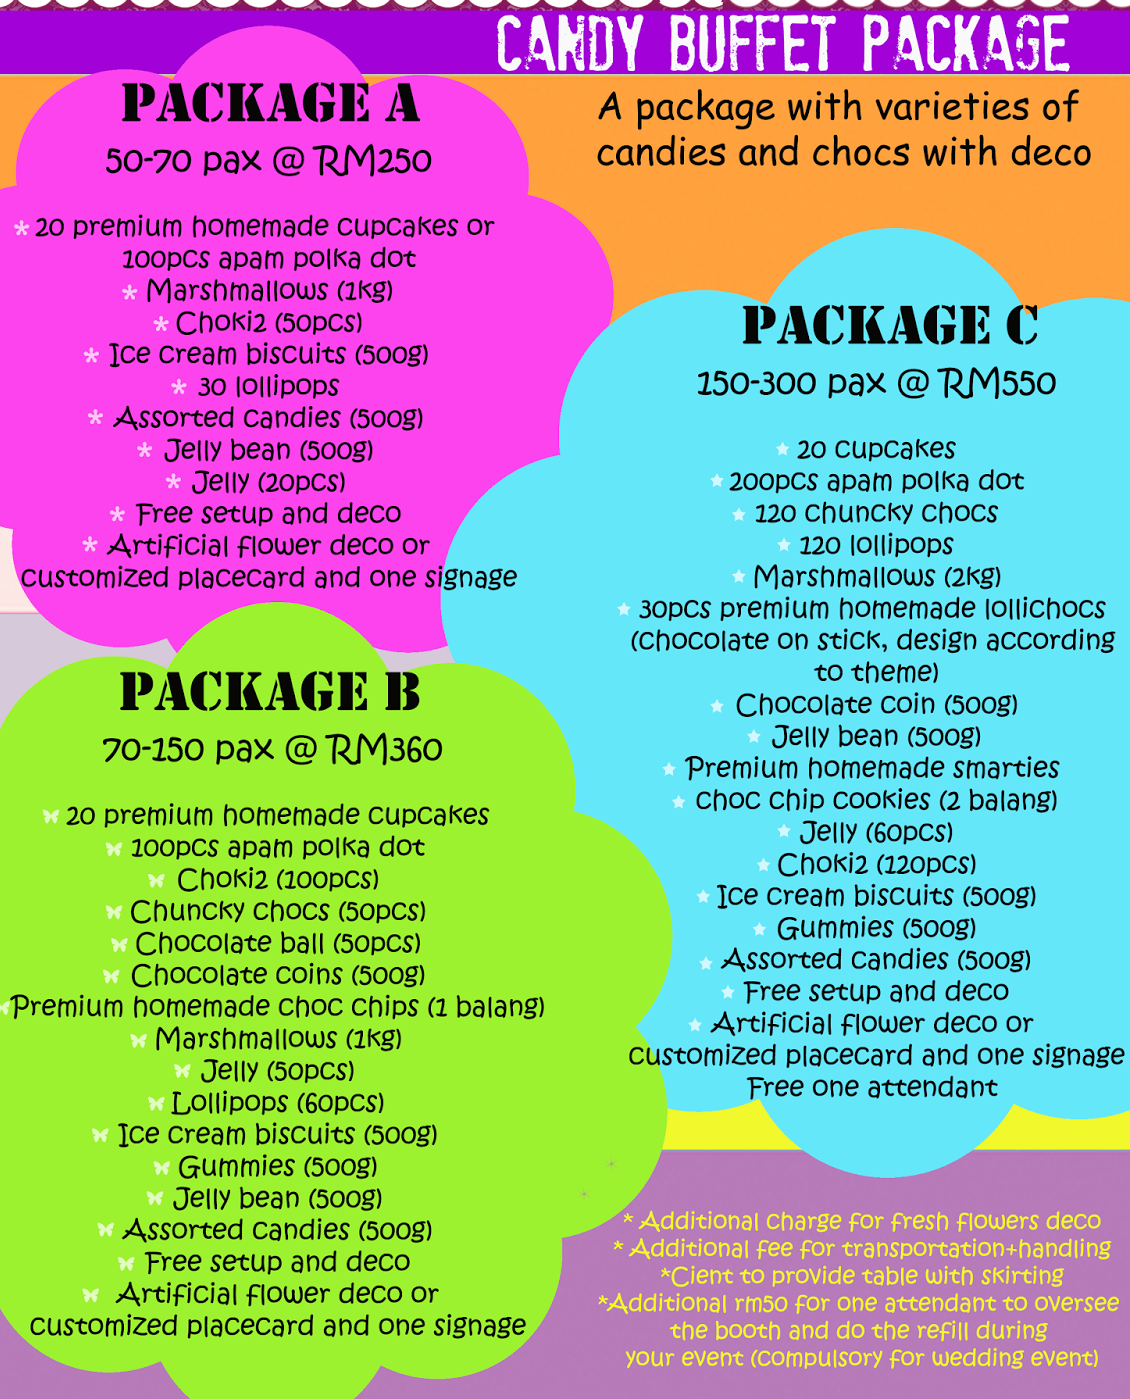 candy buffet pricing 12 muu buyfresh store u2022 12 muu buyfresh store rh 12 muu buyfresh store candy buffet prices nj candy table pricing